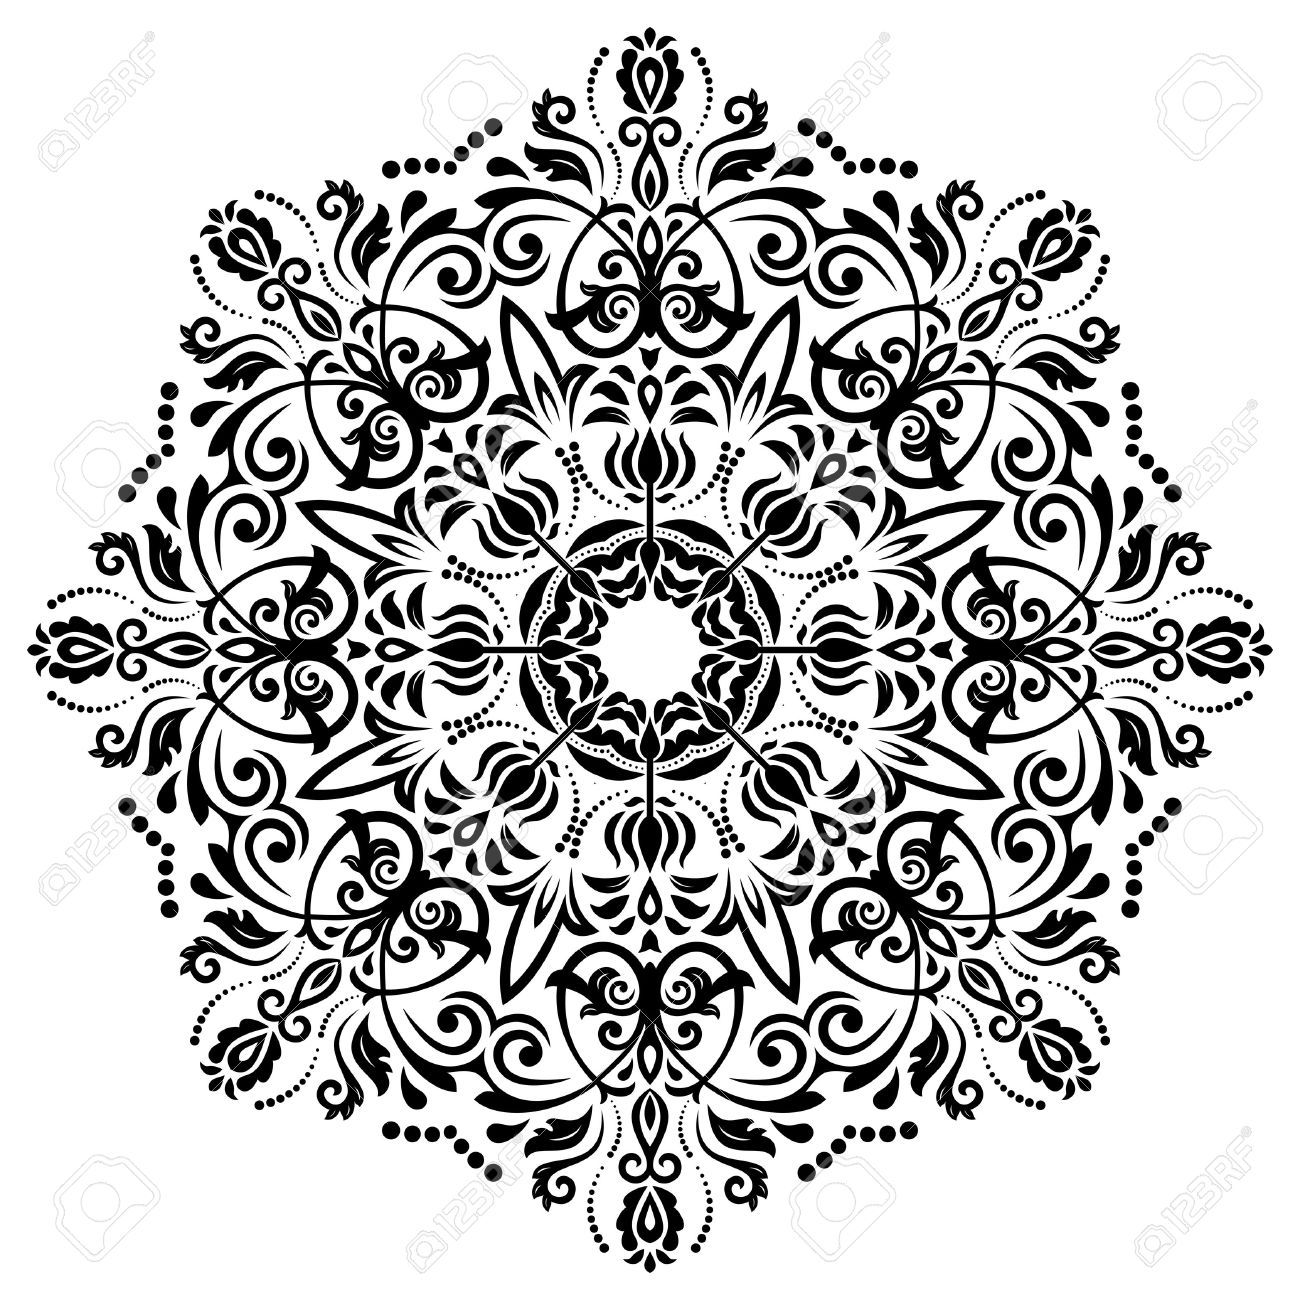 Tattoos arabesque tattoos arabeske tattoos arabesk tattoos - Damask Vekt R Arabesk Ve Oryantal Unsurlar Ile I Ek Deseni Zet Geleneksel